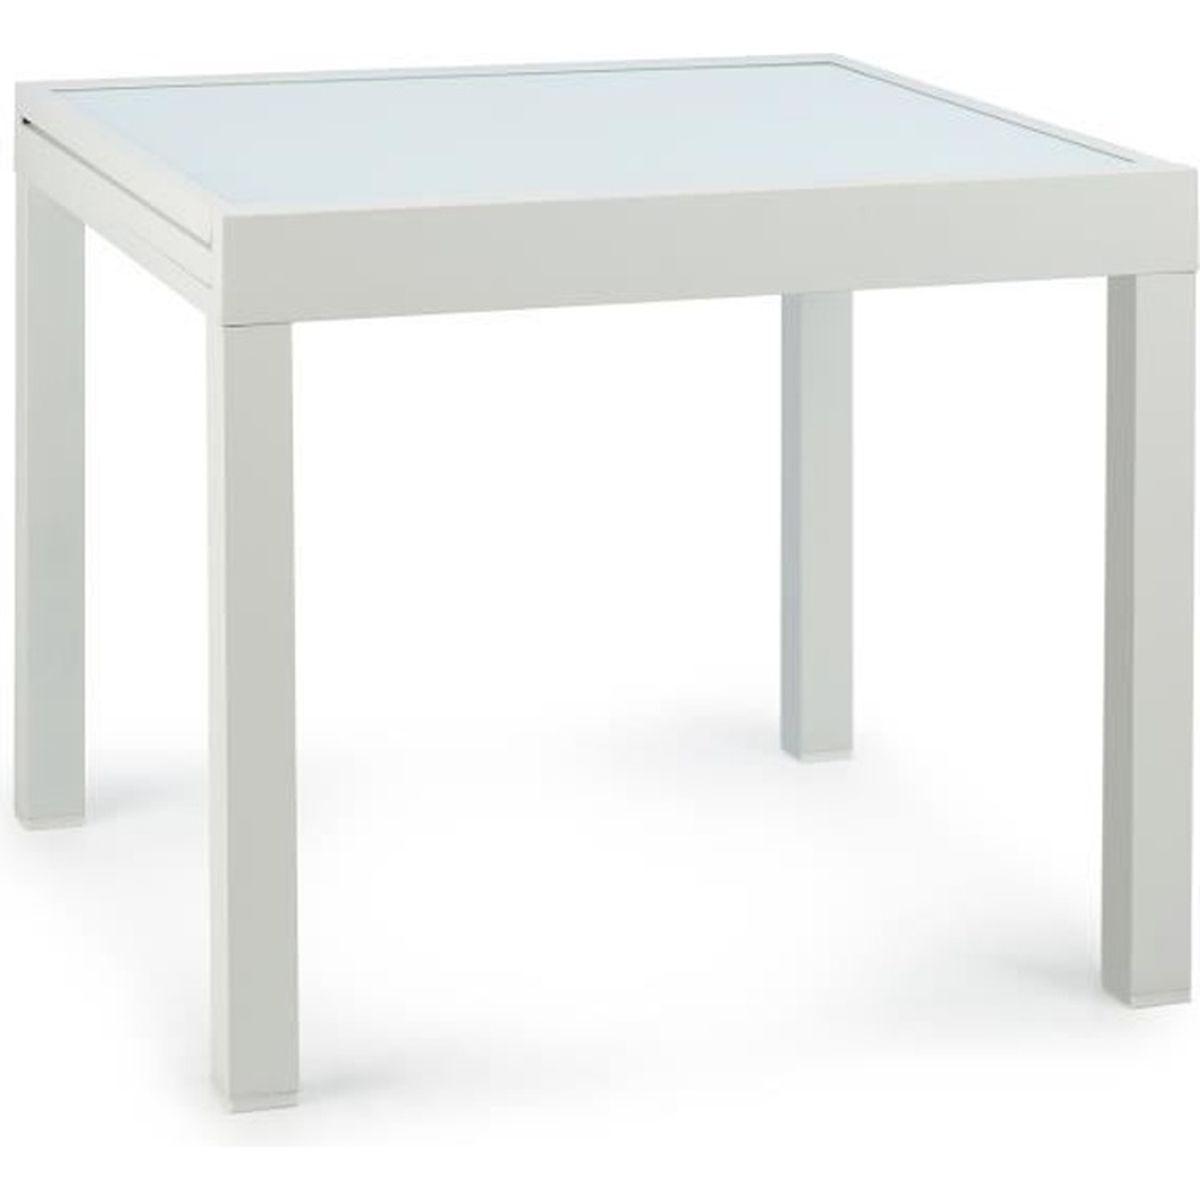 Table de jardin carre extensible